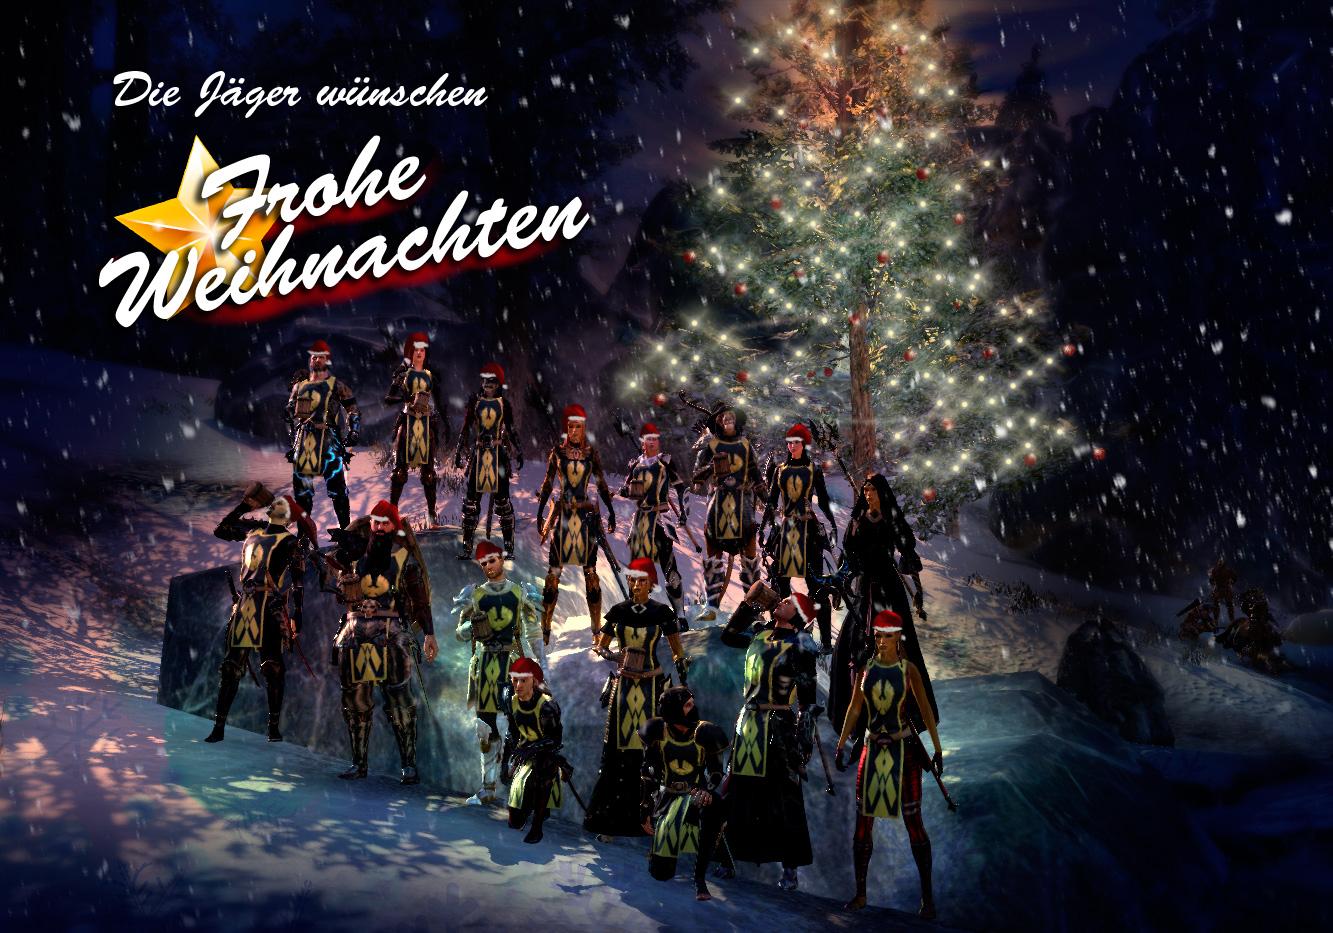 Frohe Weihnachten Jager.Frohe Weihnachten Jager Der Dunkelheit